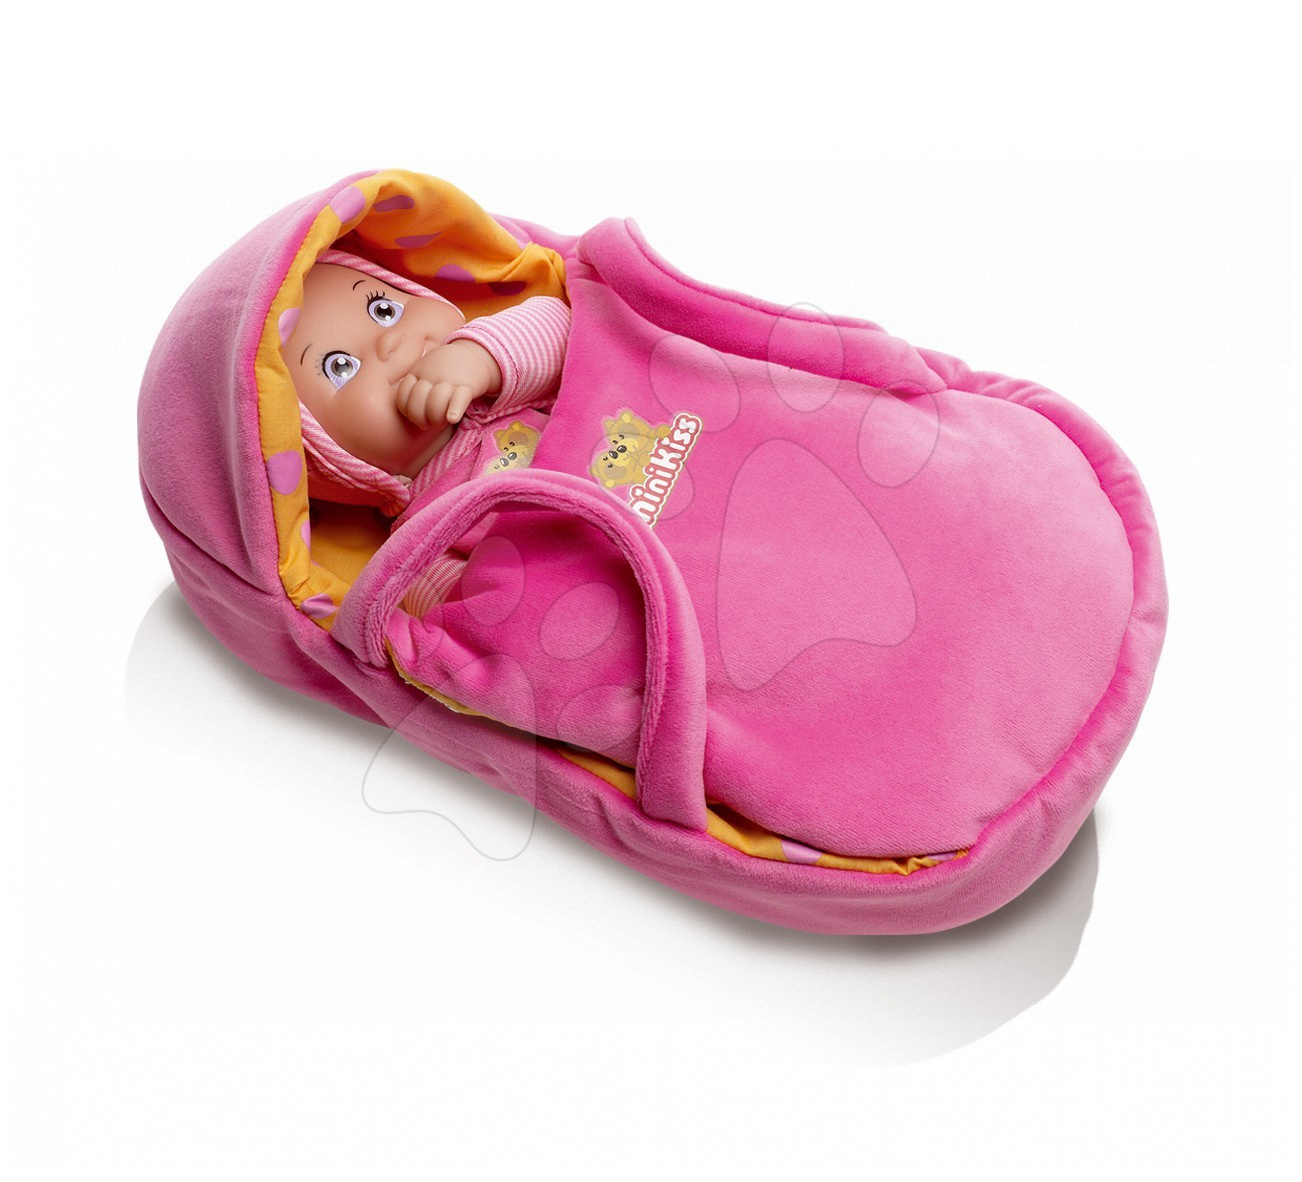 Minikiss baby carry fusak Smoby pre 27 cm bábiku od 12 mes